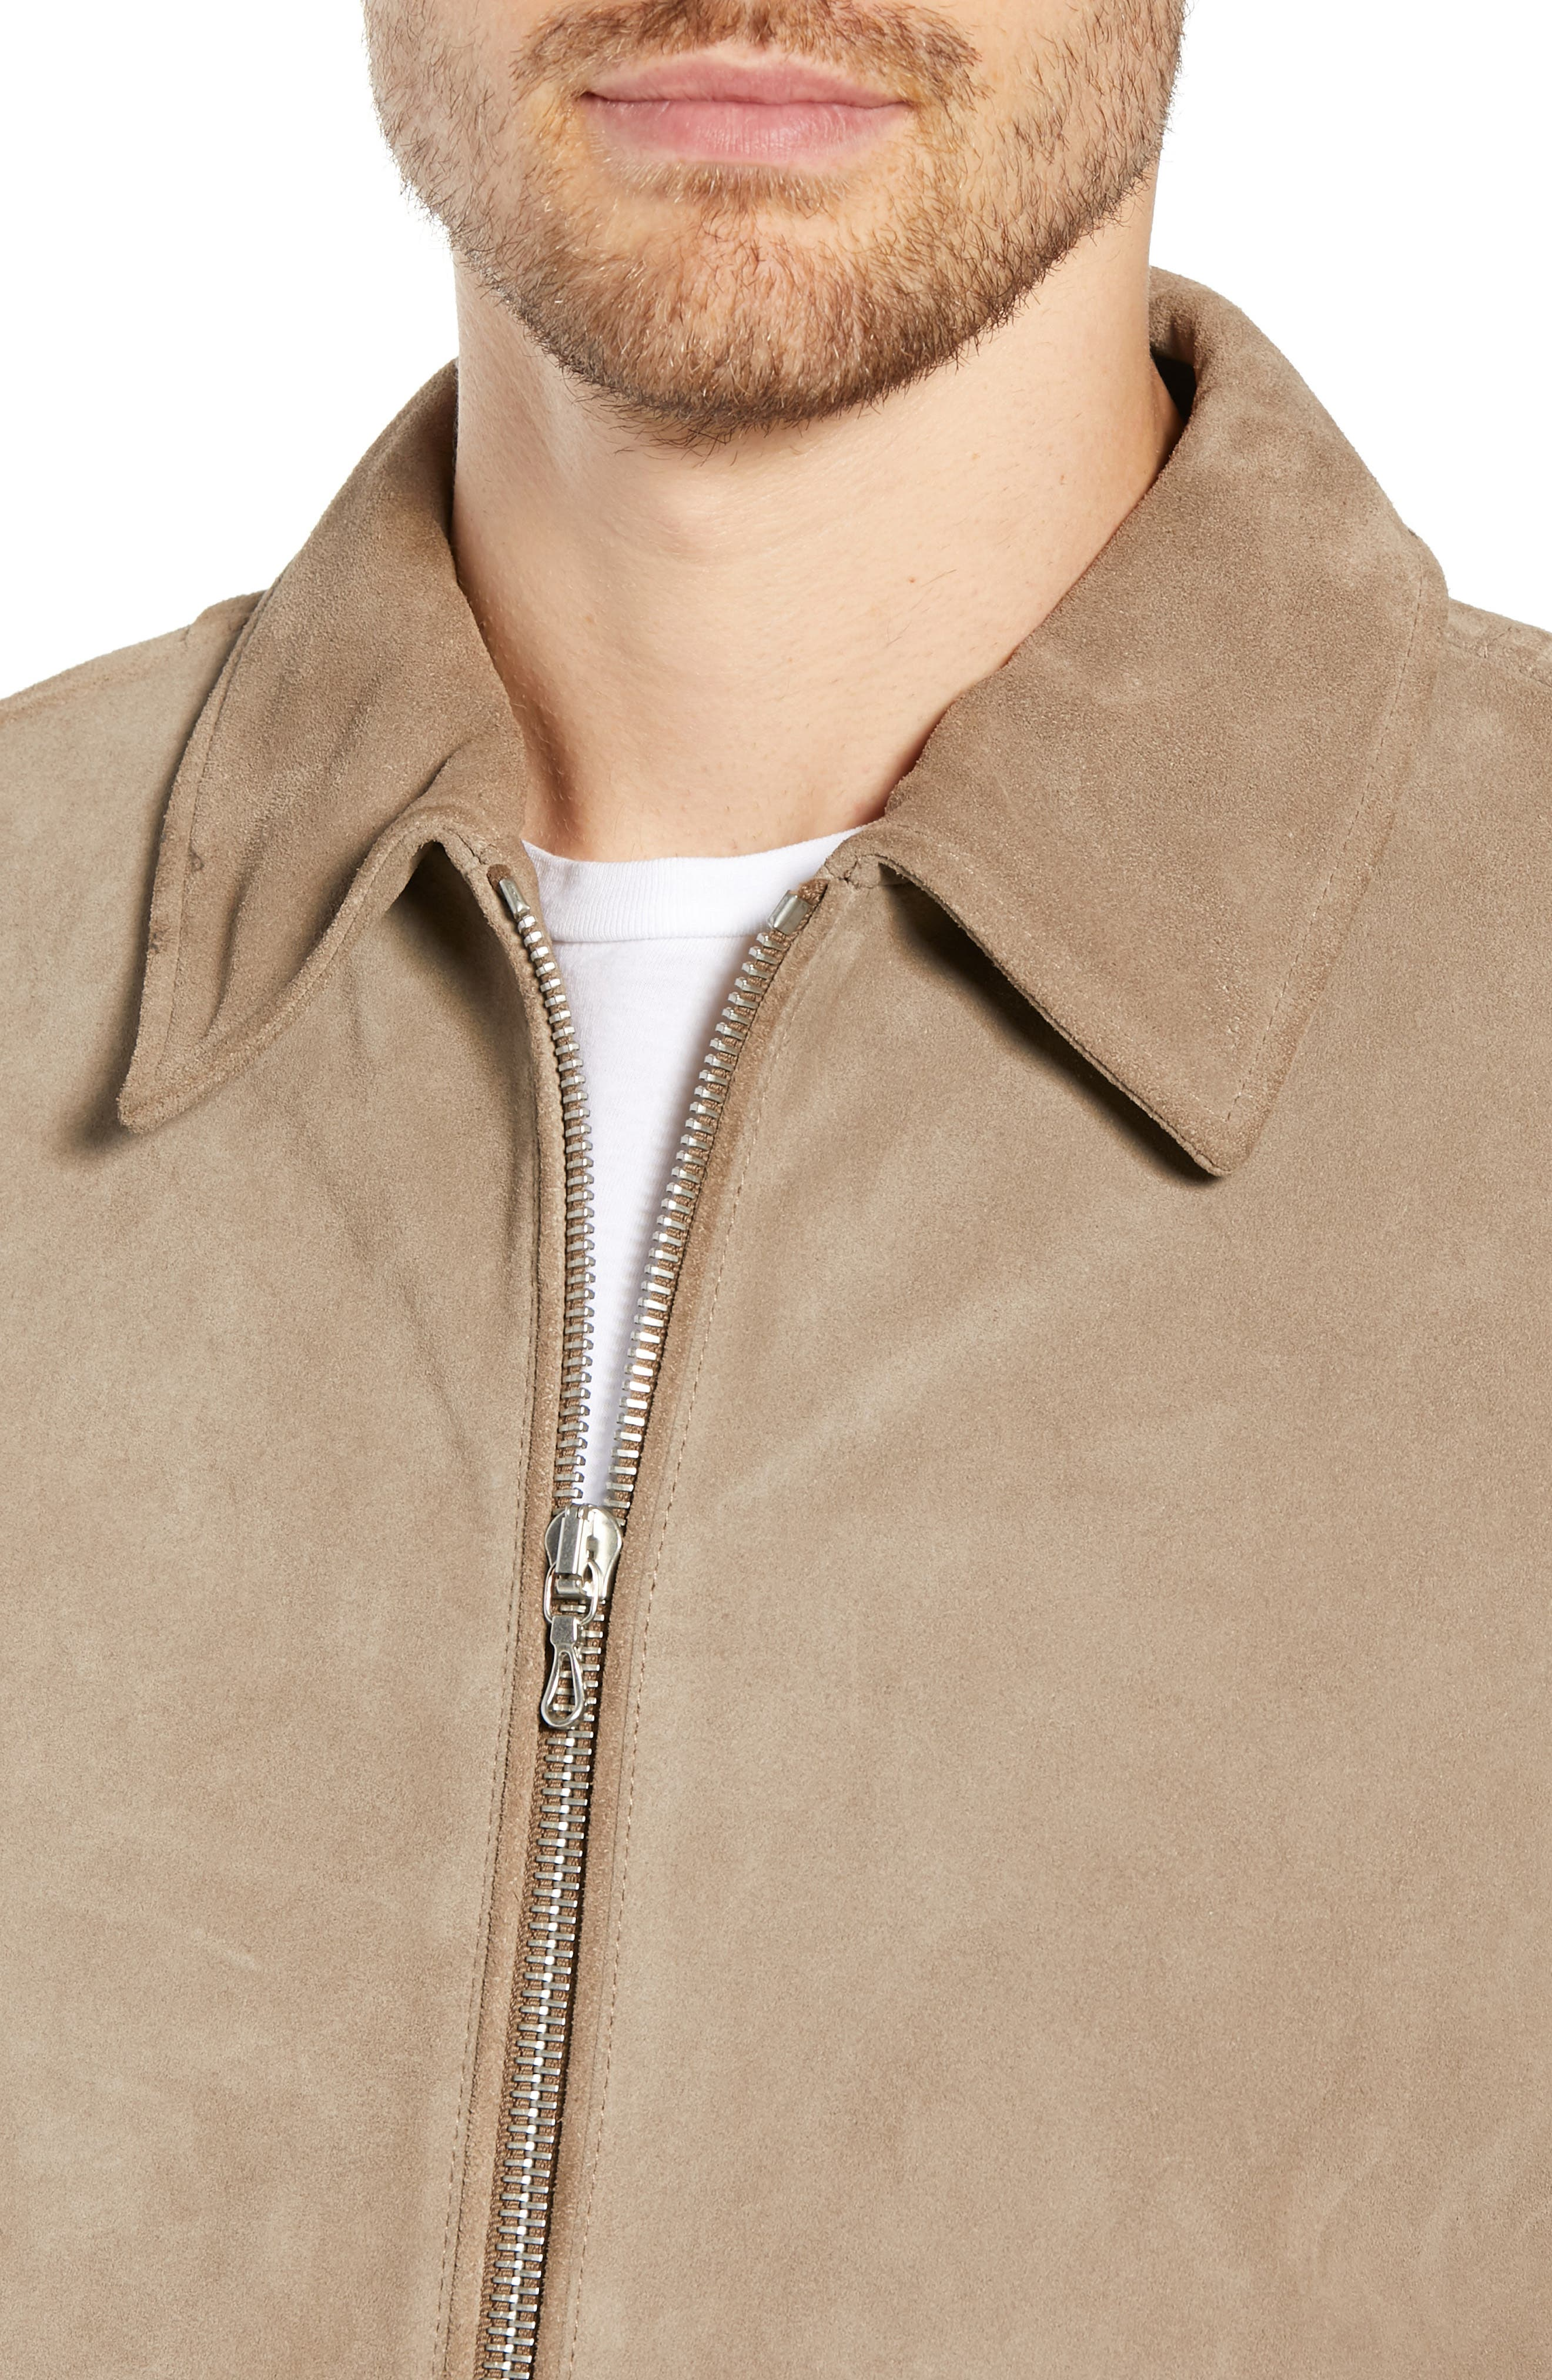 RAG & BONE,                             Regular Fit Suede Garage Jacket,                             Alternate thumbnail 4, color,                             CEMENT